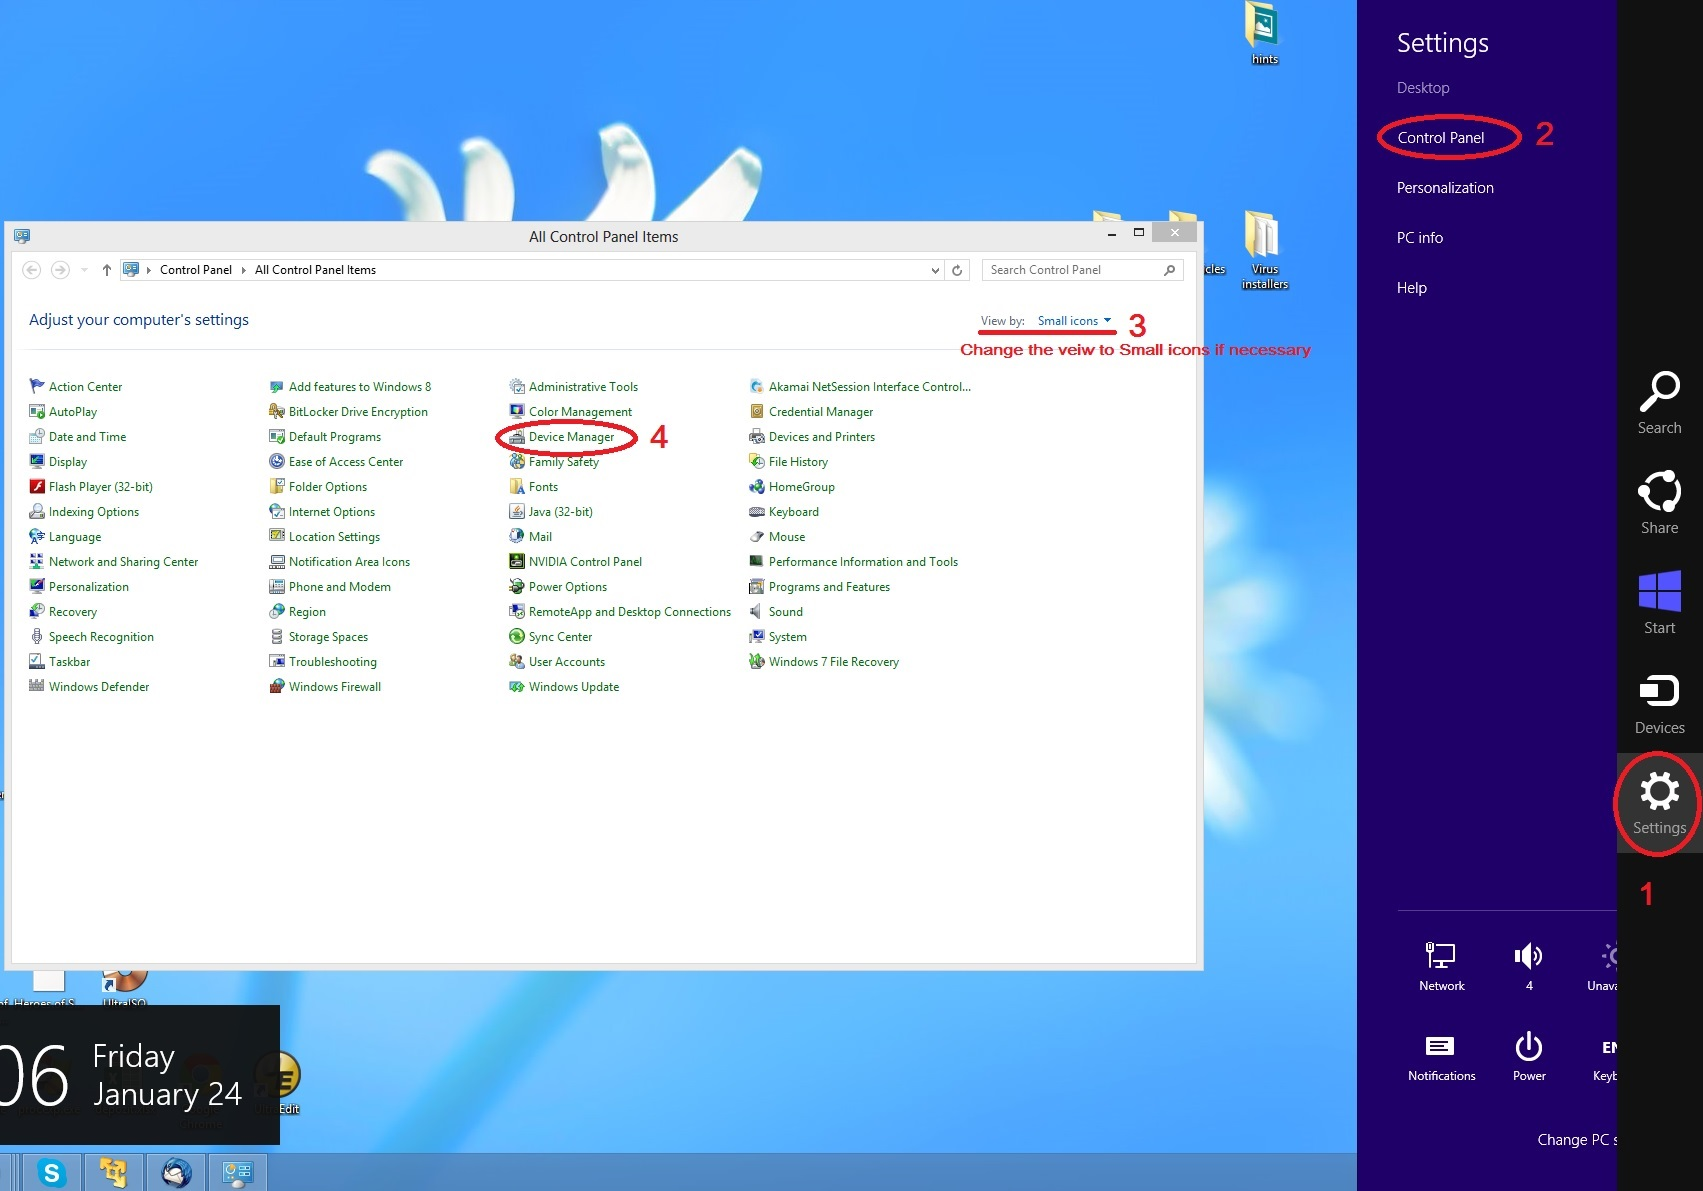 windows 8.1 network driver problem